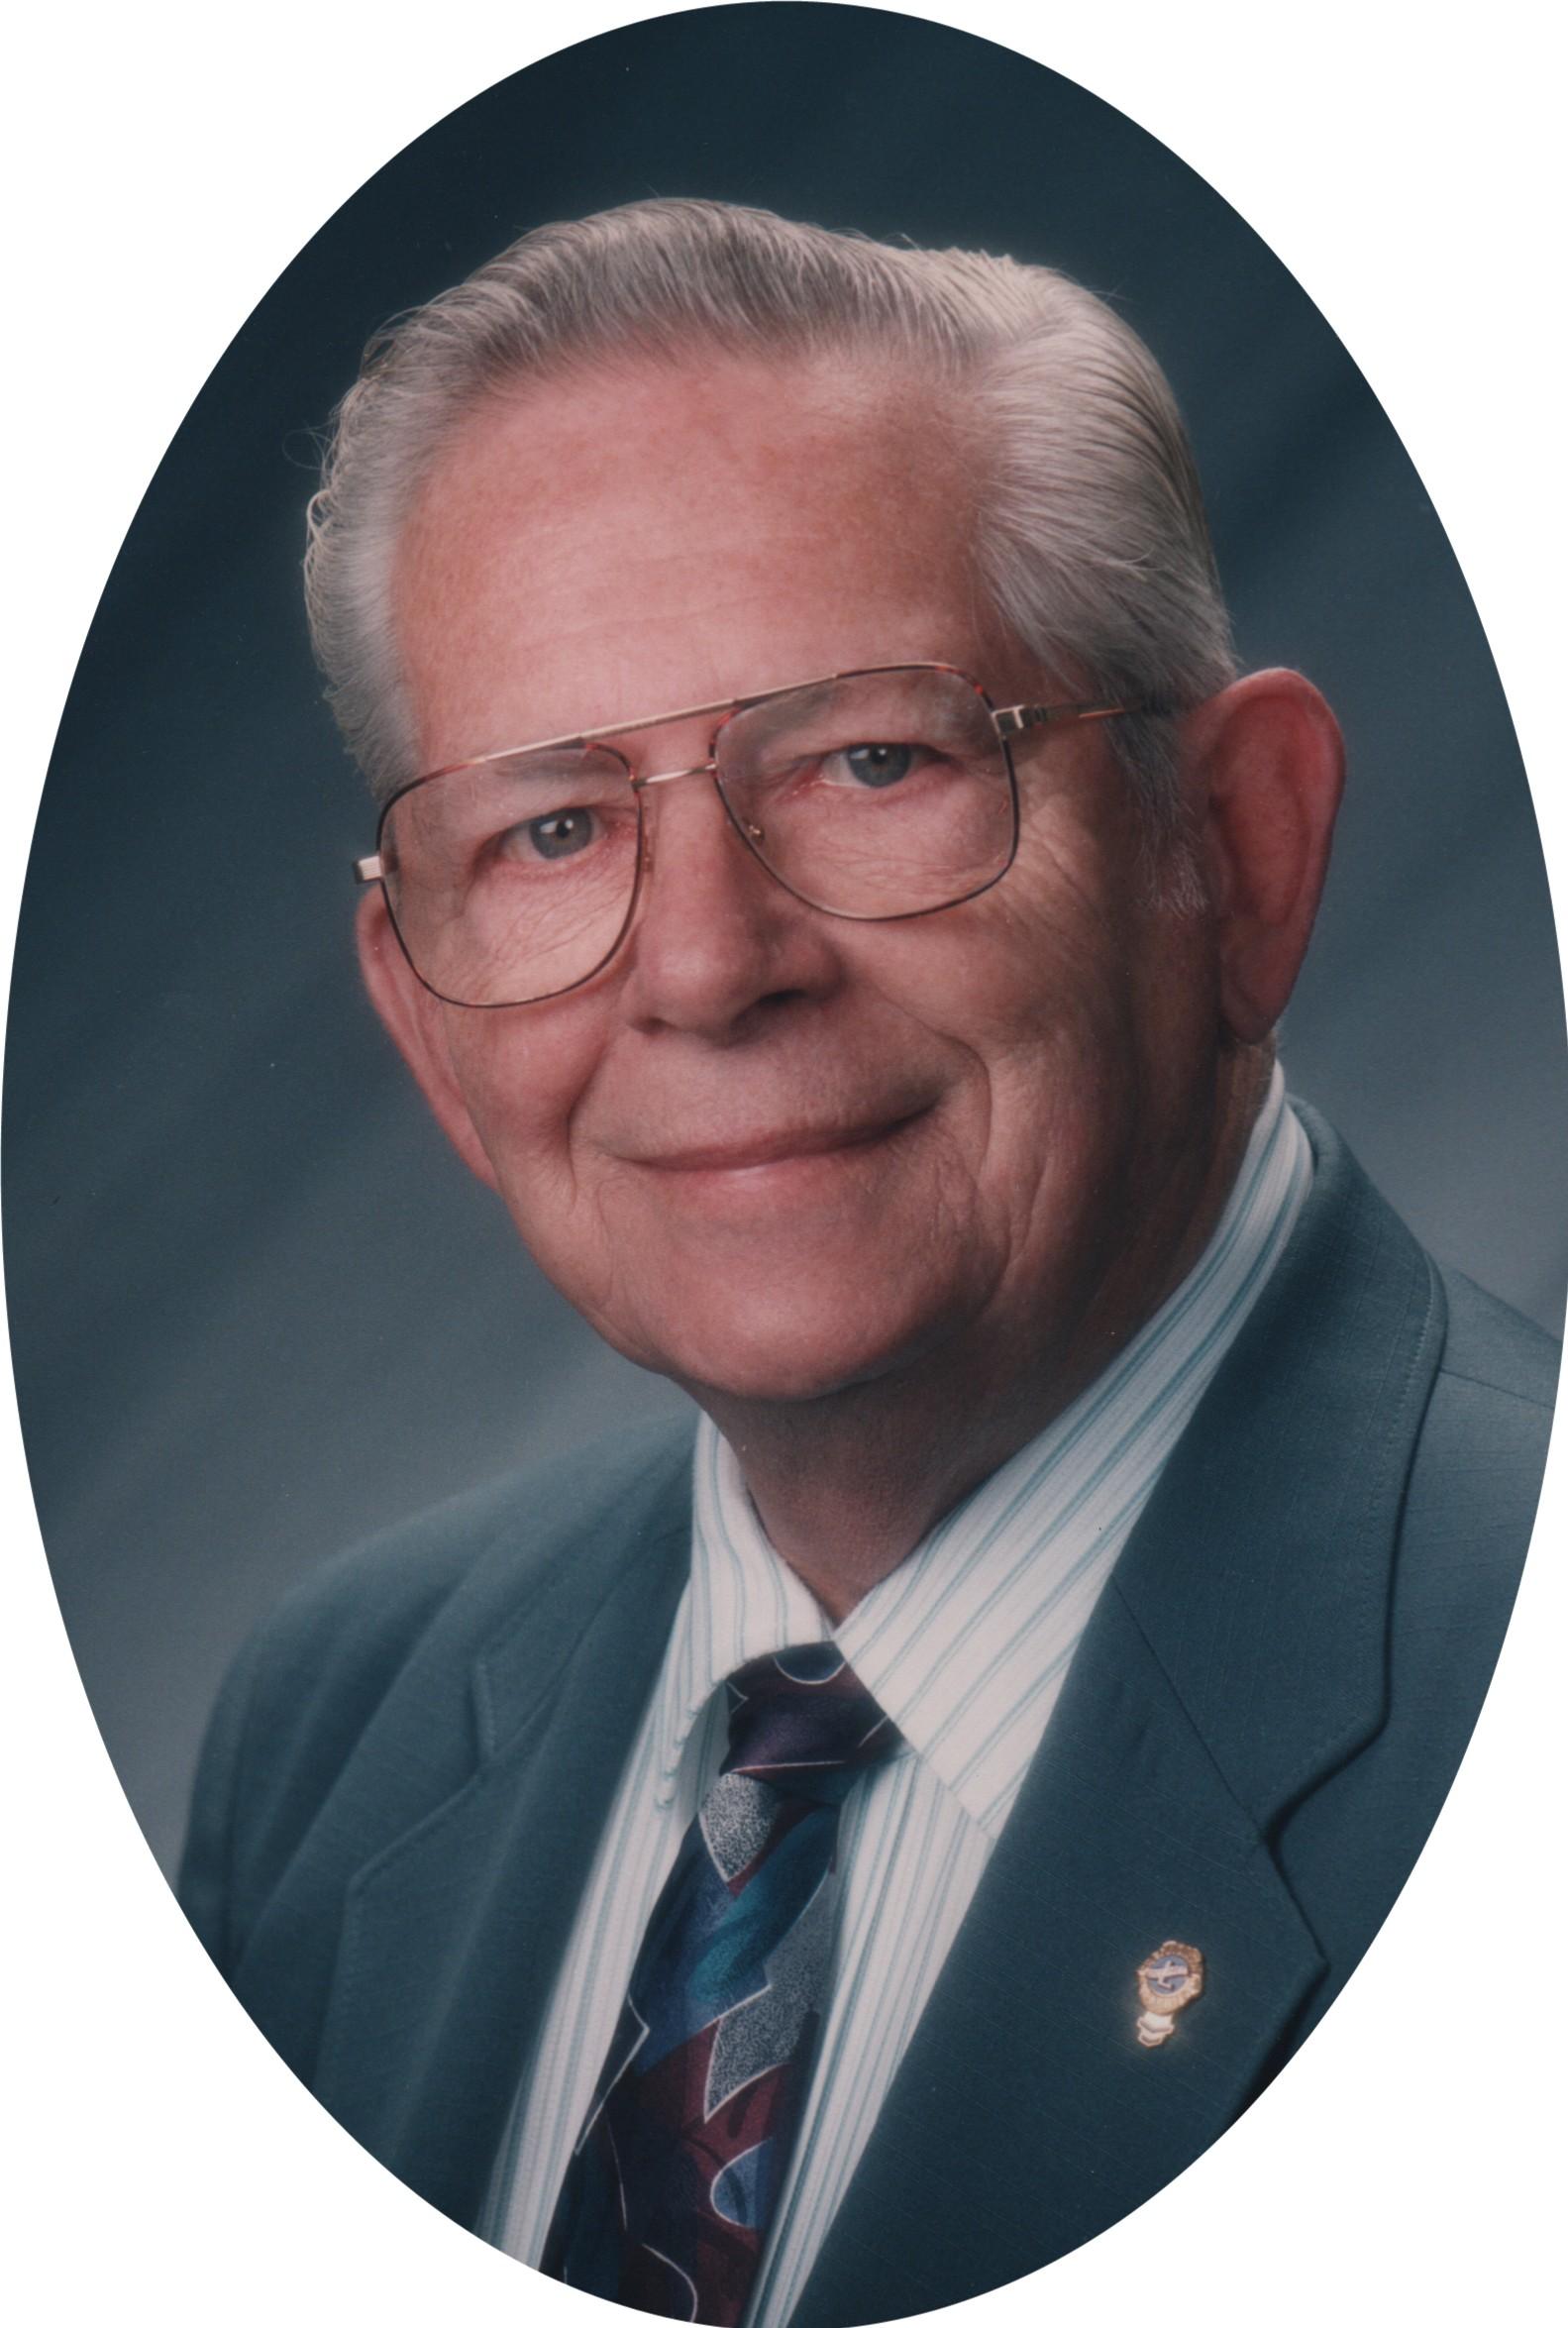 Robert F. Mowrer